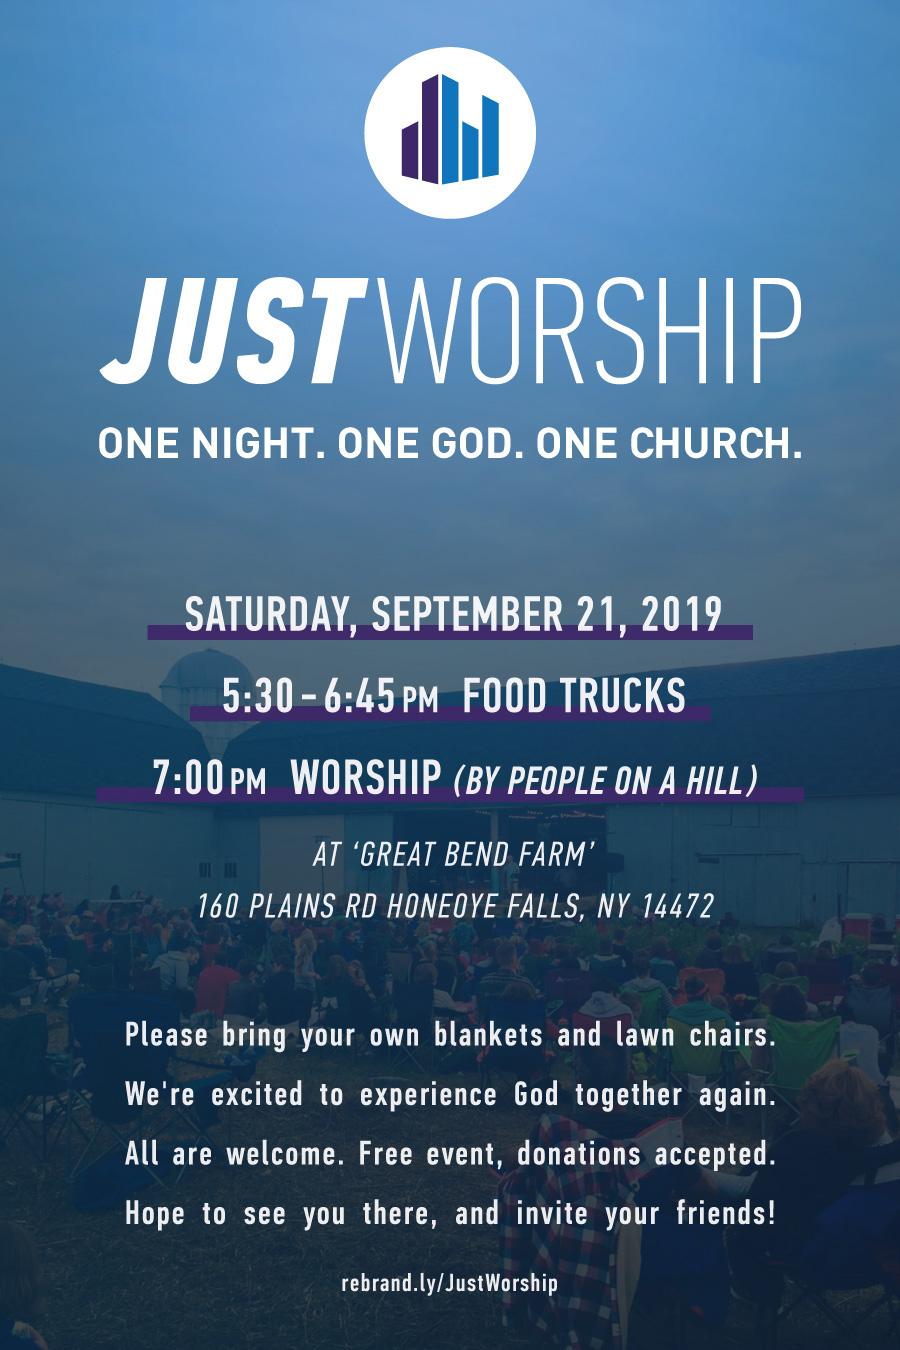 Just-Worship-Sendout-4.jpg